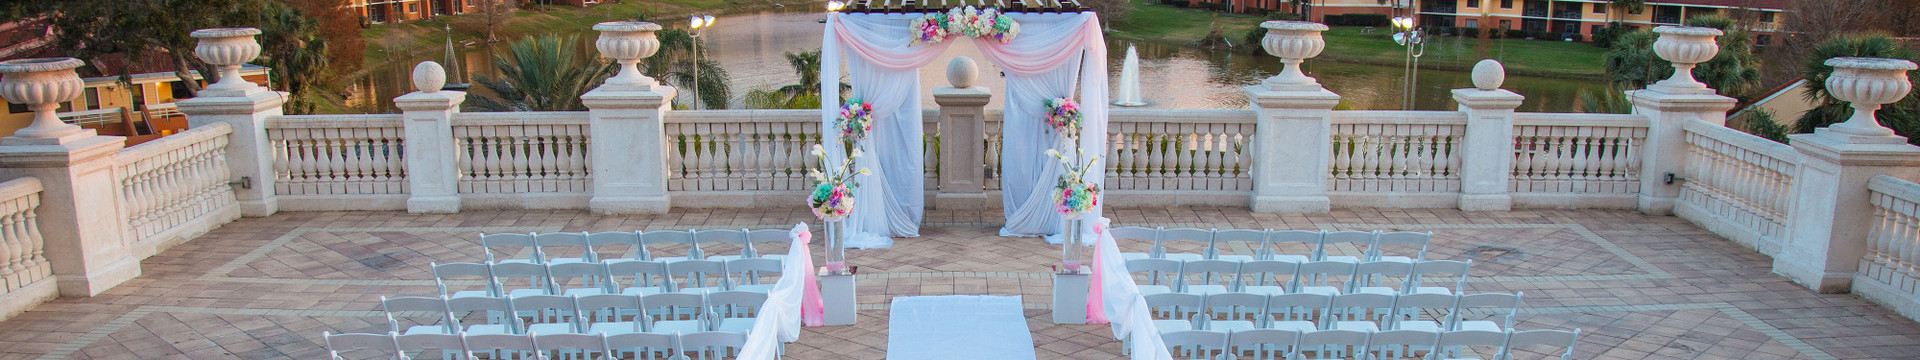 Kissimmee Hotel Wedding Deals - Ceremony Space @ Westgate Town Center Resort